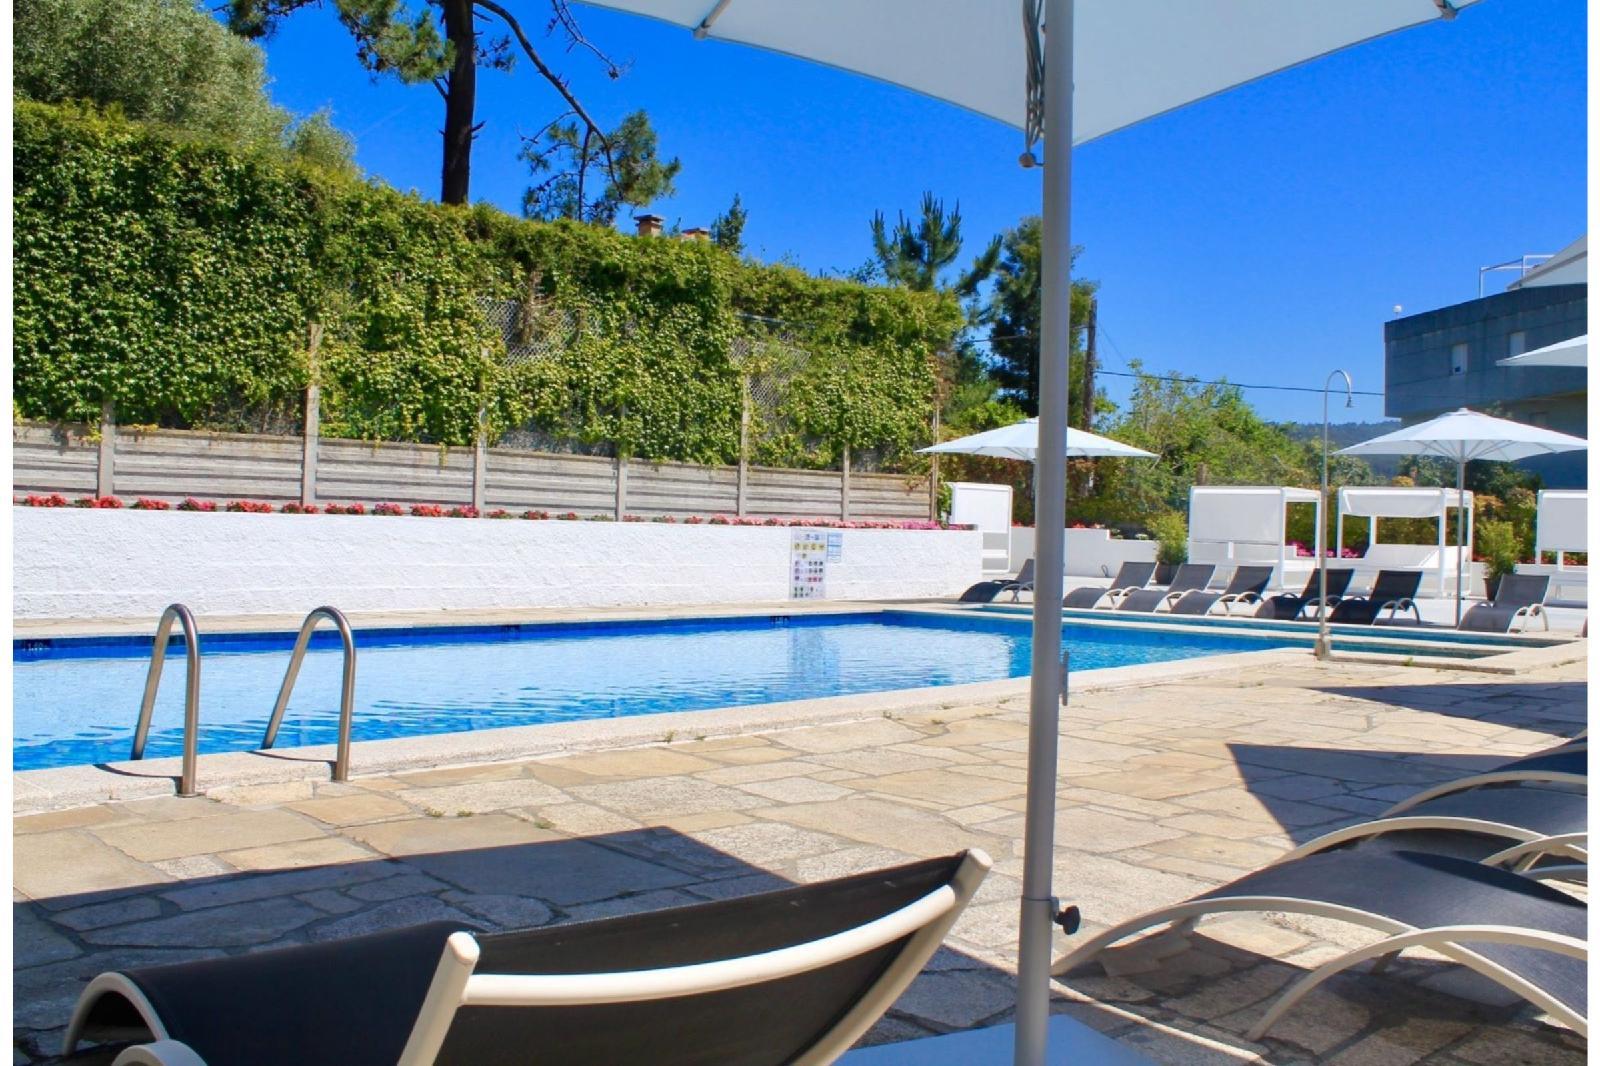 24. Hotel Silgar 92